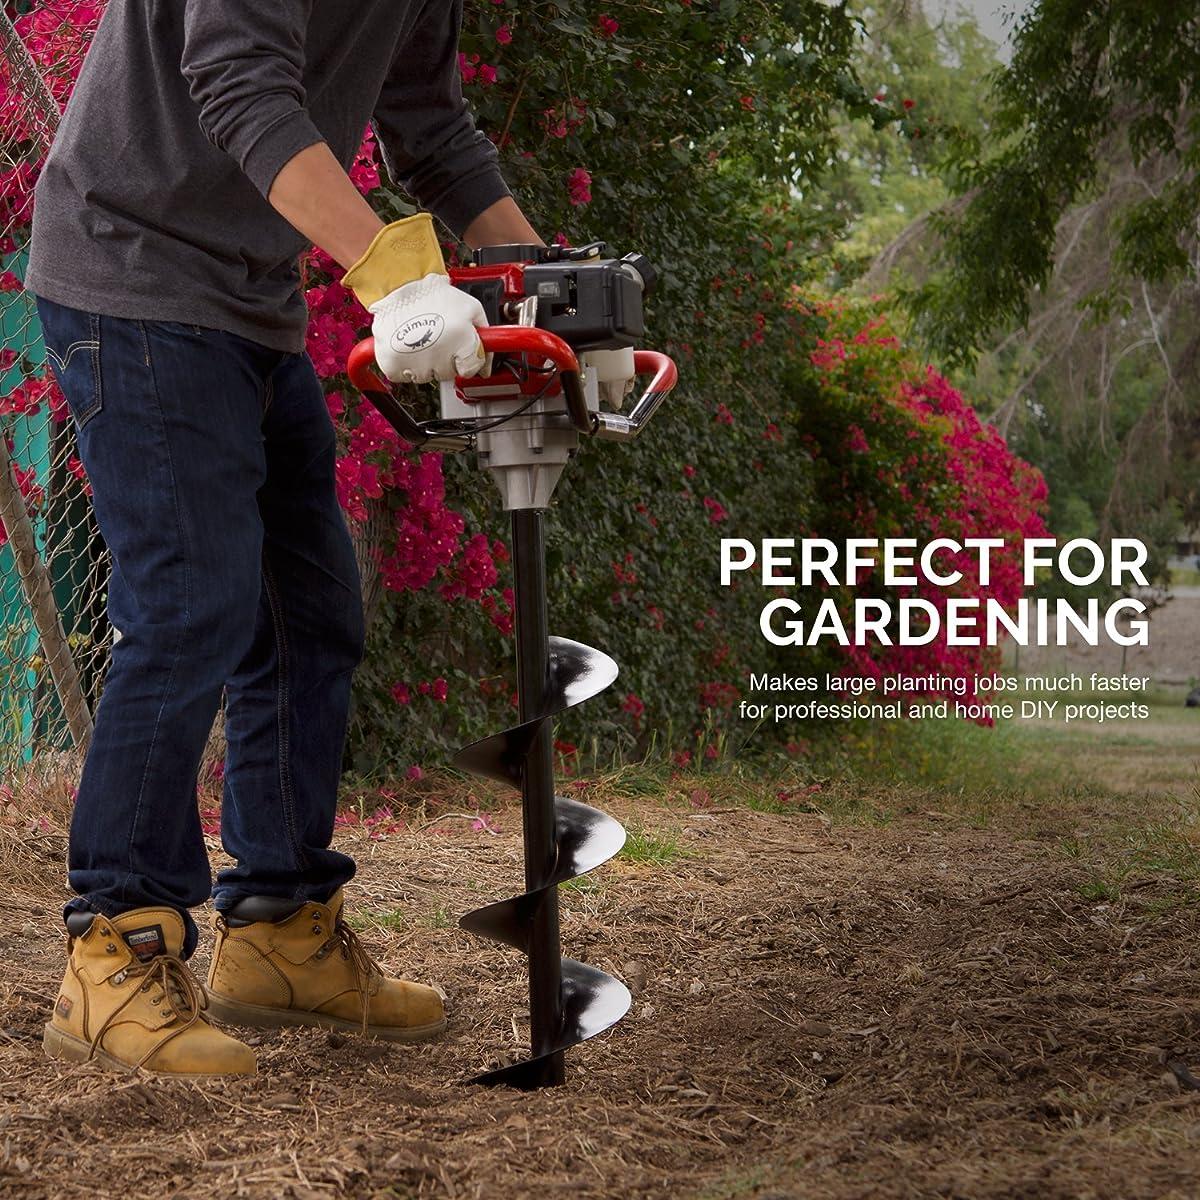 "Hiltex 10245 4""x30"" Steel Gardening Auger Bit   For Planting Bedding, Bulbs, Seedlings   3/4"" Shaft"